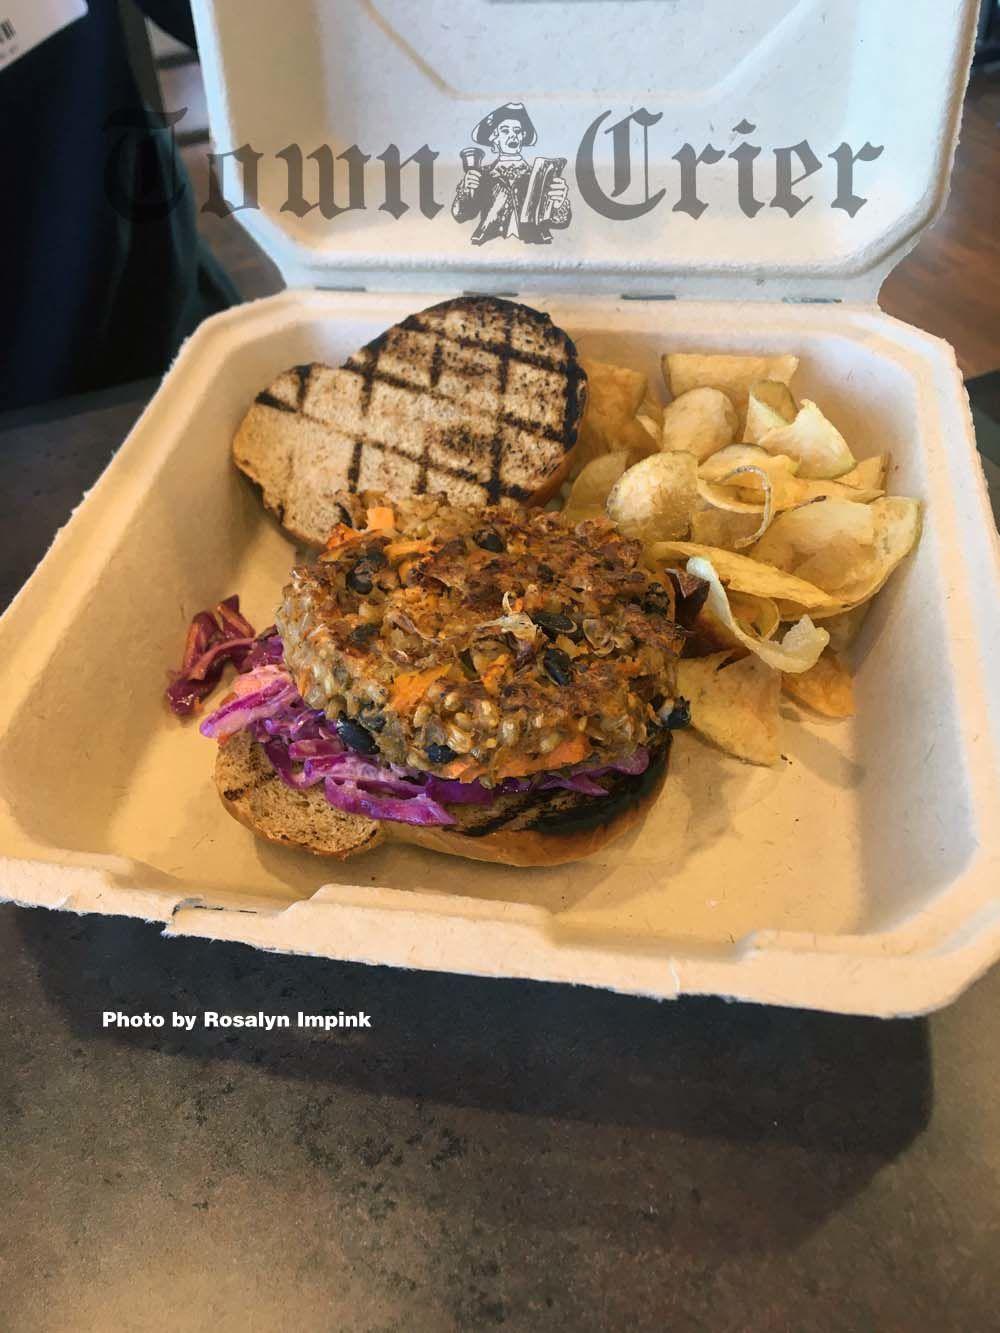 The Vegetastic! veggie burger